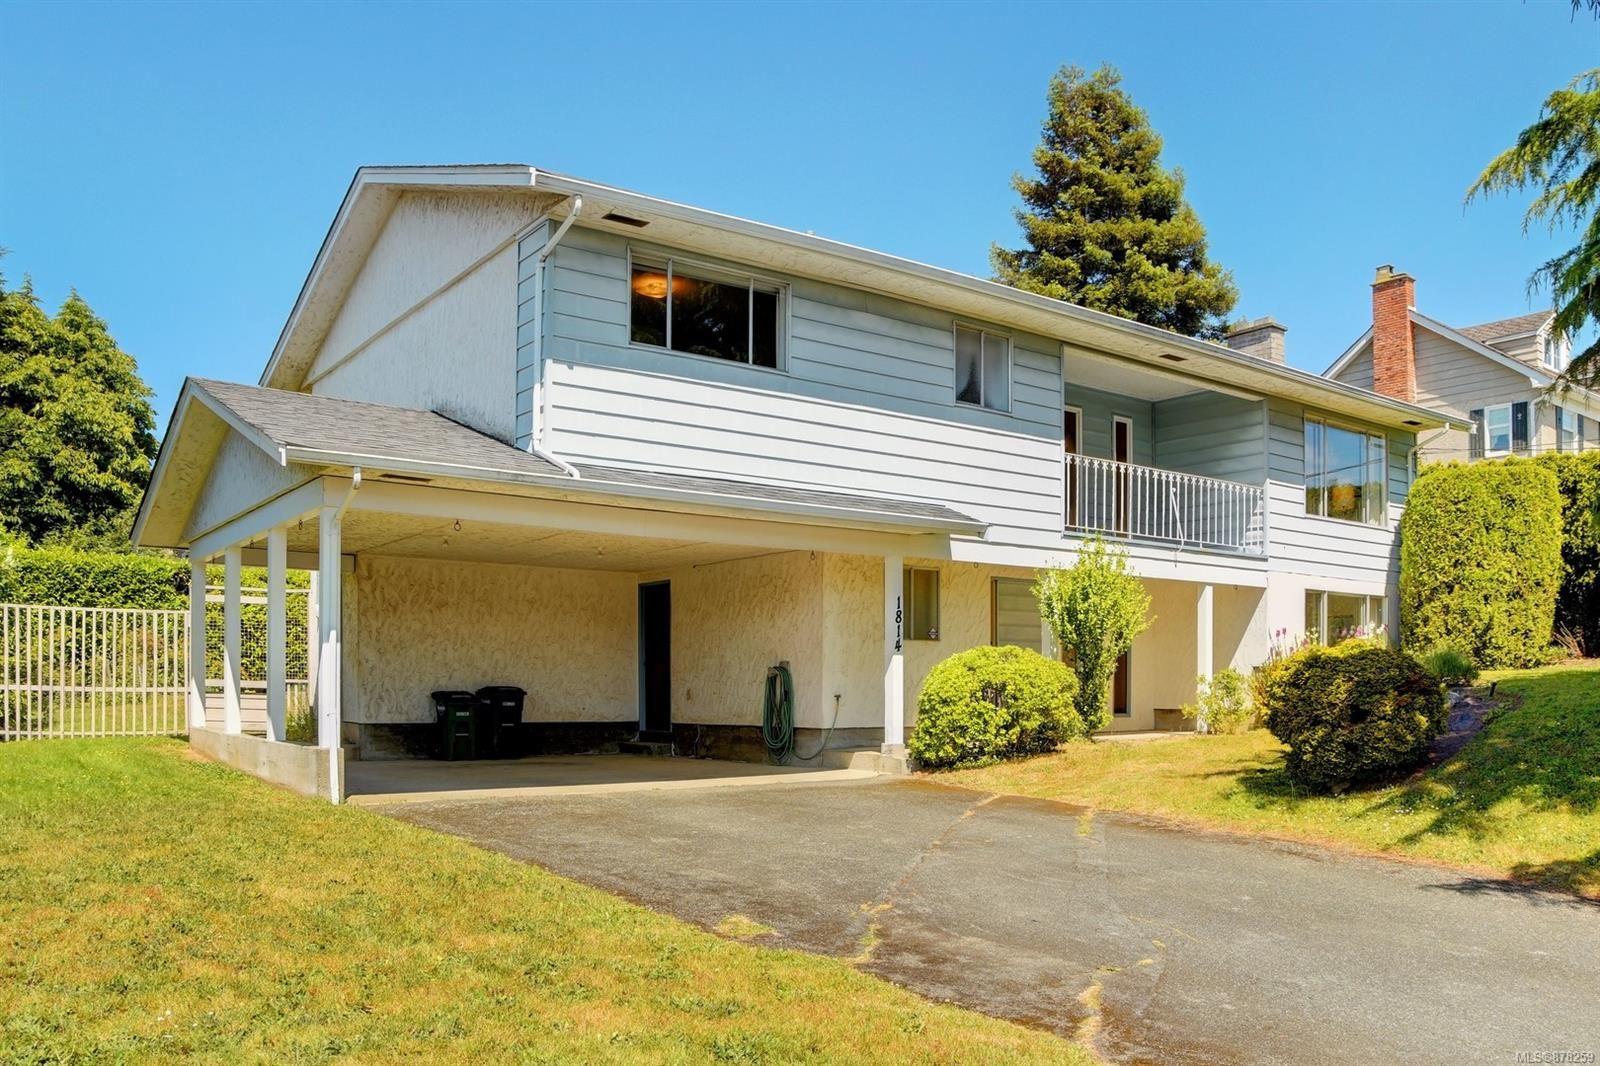 Main Photo: 1814 San Juan Ave in : SE Gordon Head House for sale (Saanich East)  : MLS®# 878259